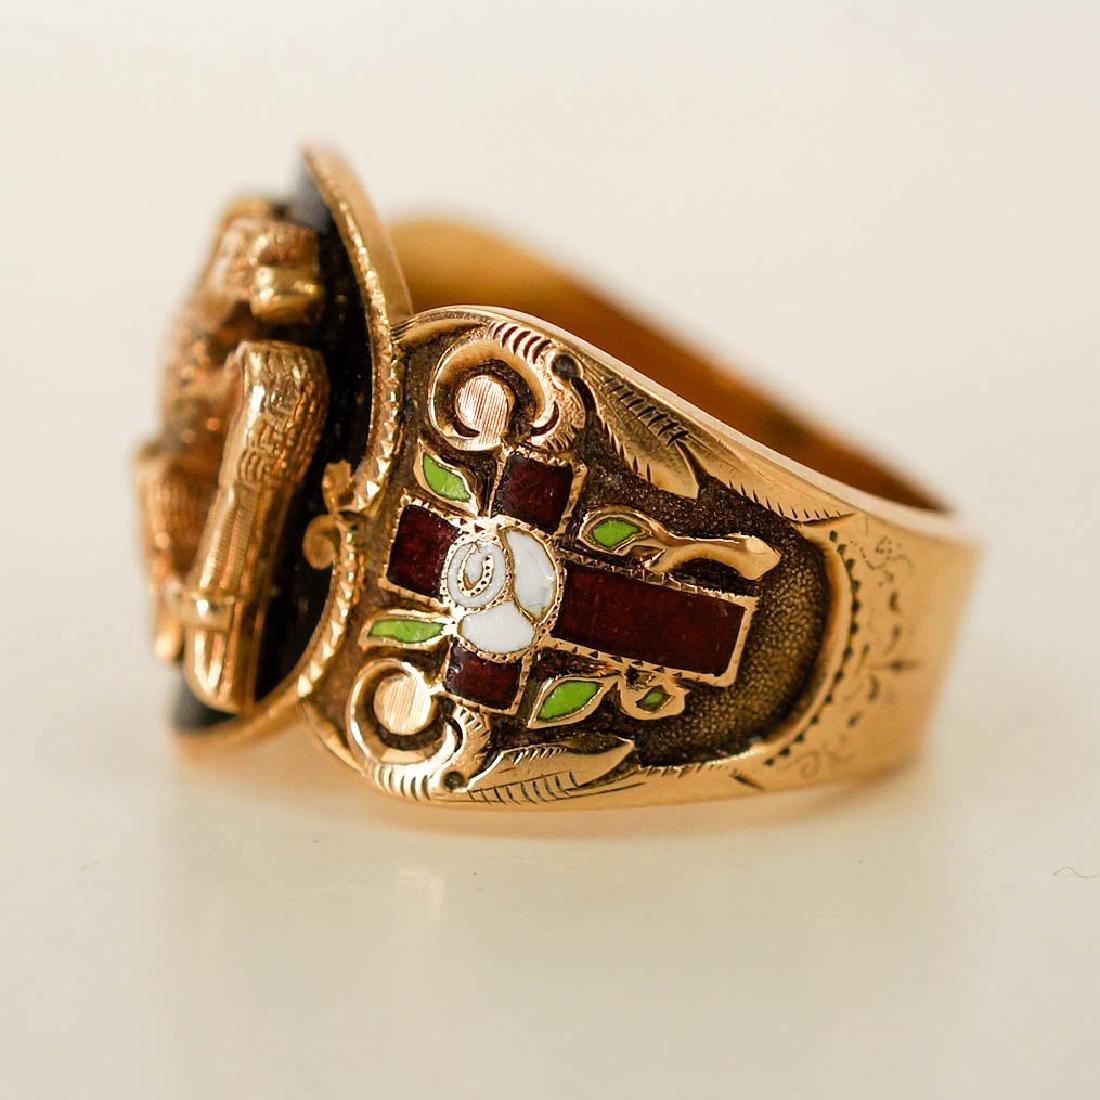 Vintage Masonic 14k Yellow Gold Enamel Ring - 2